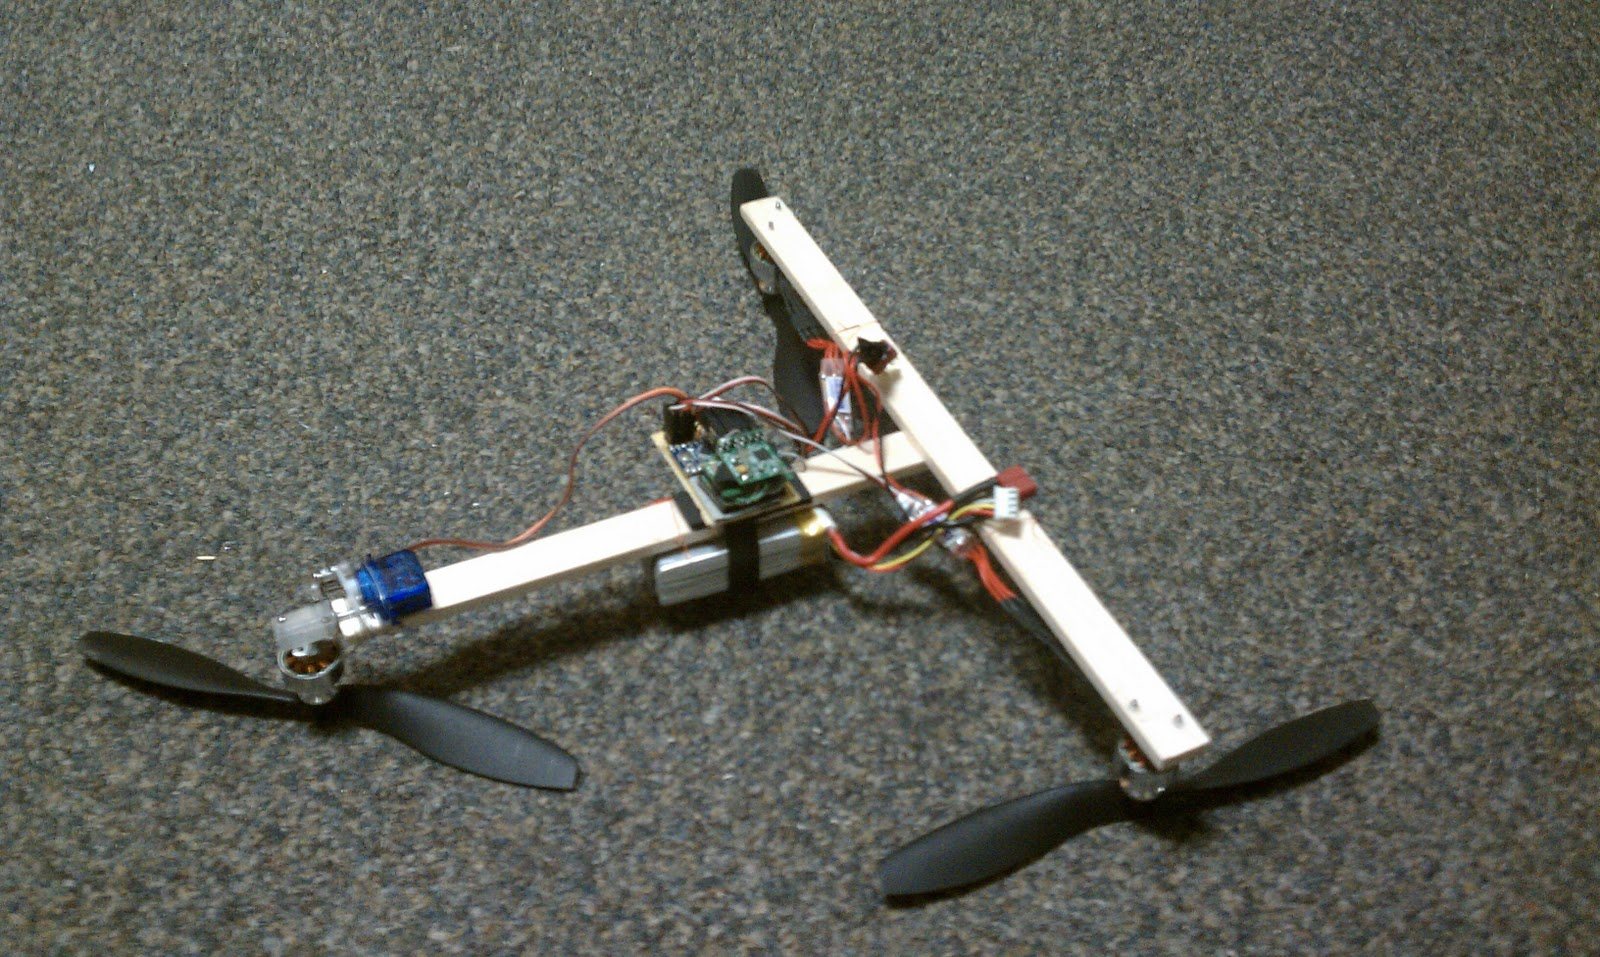 make everything: carbon fiber tricopter frame